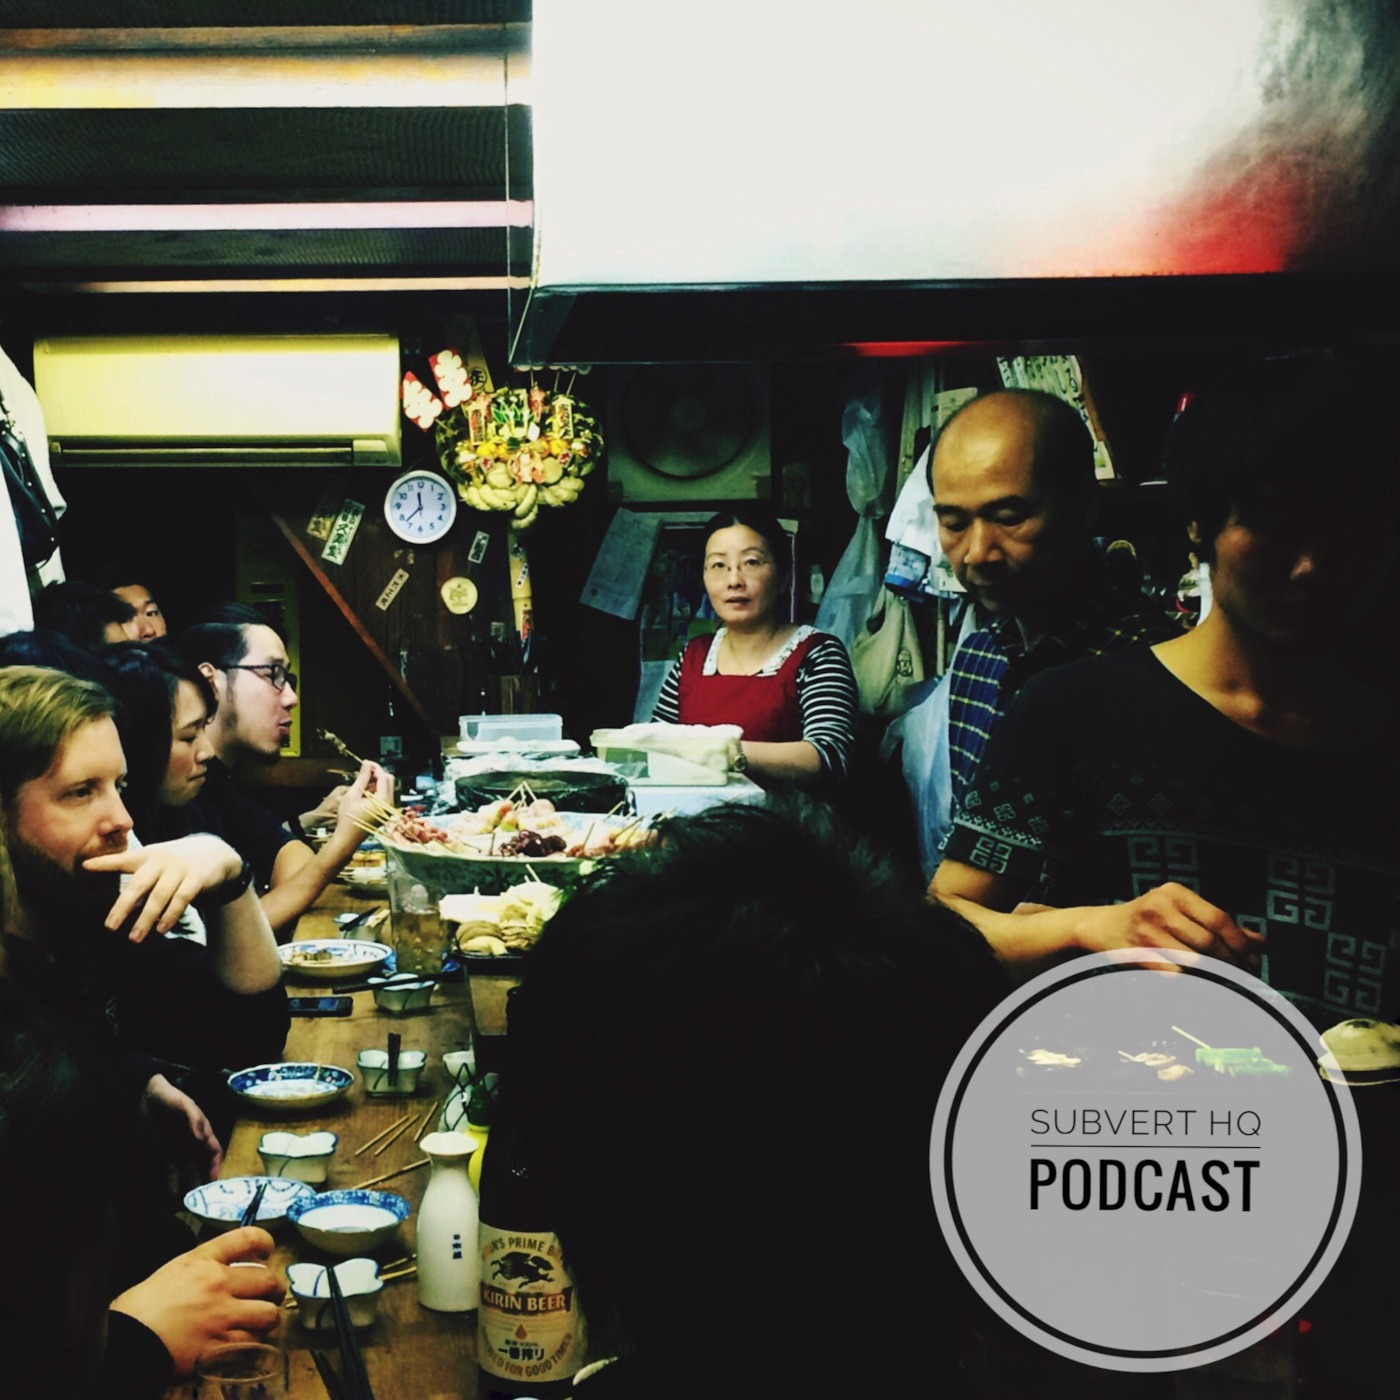 Subvert Sessions Podcast (Subvert HQ)